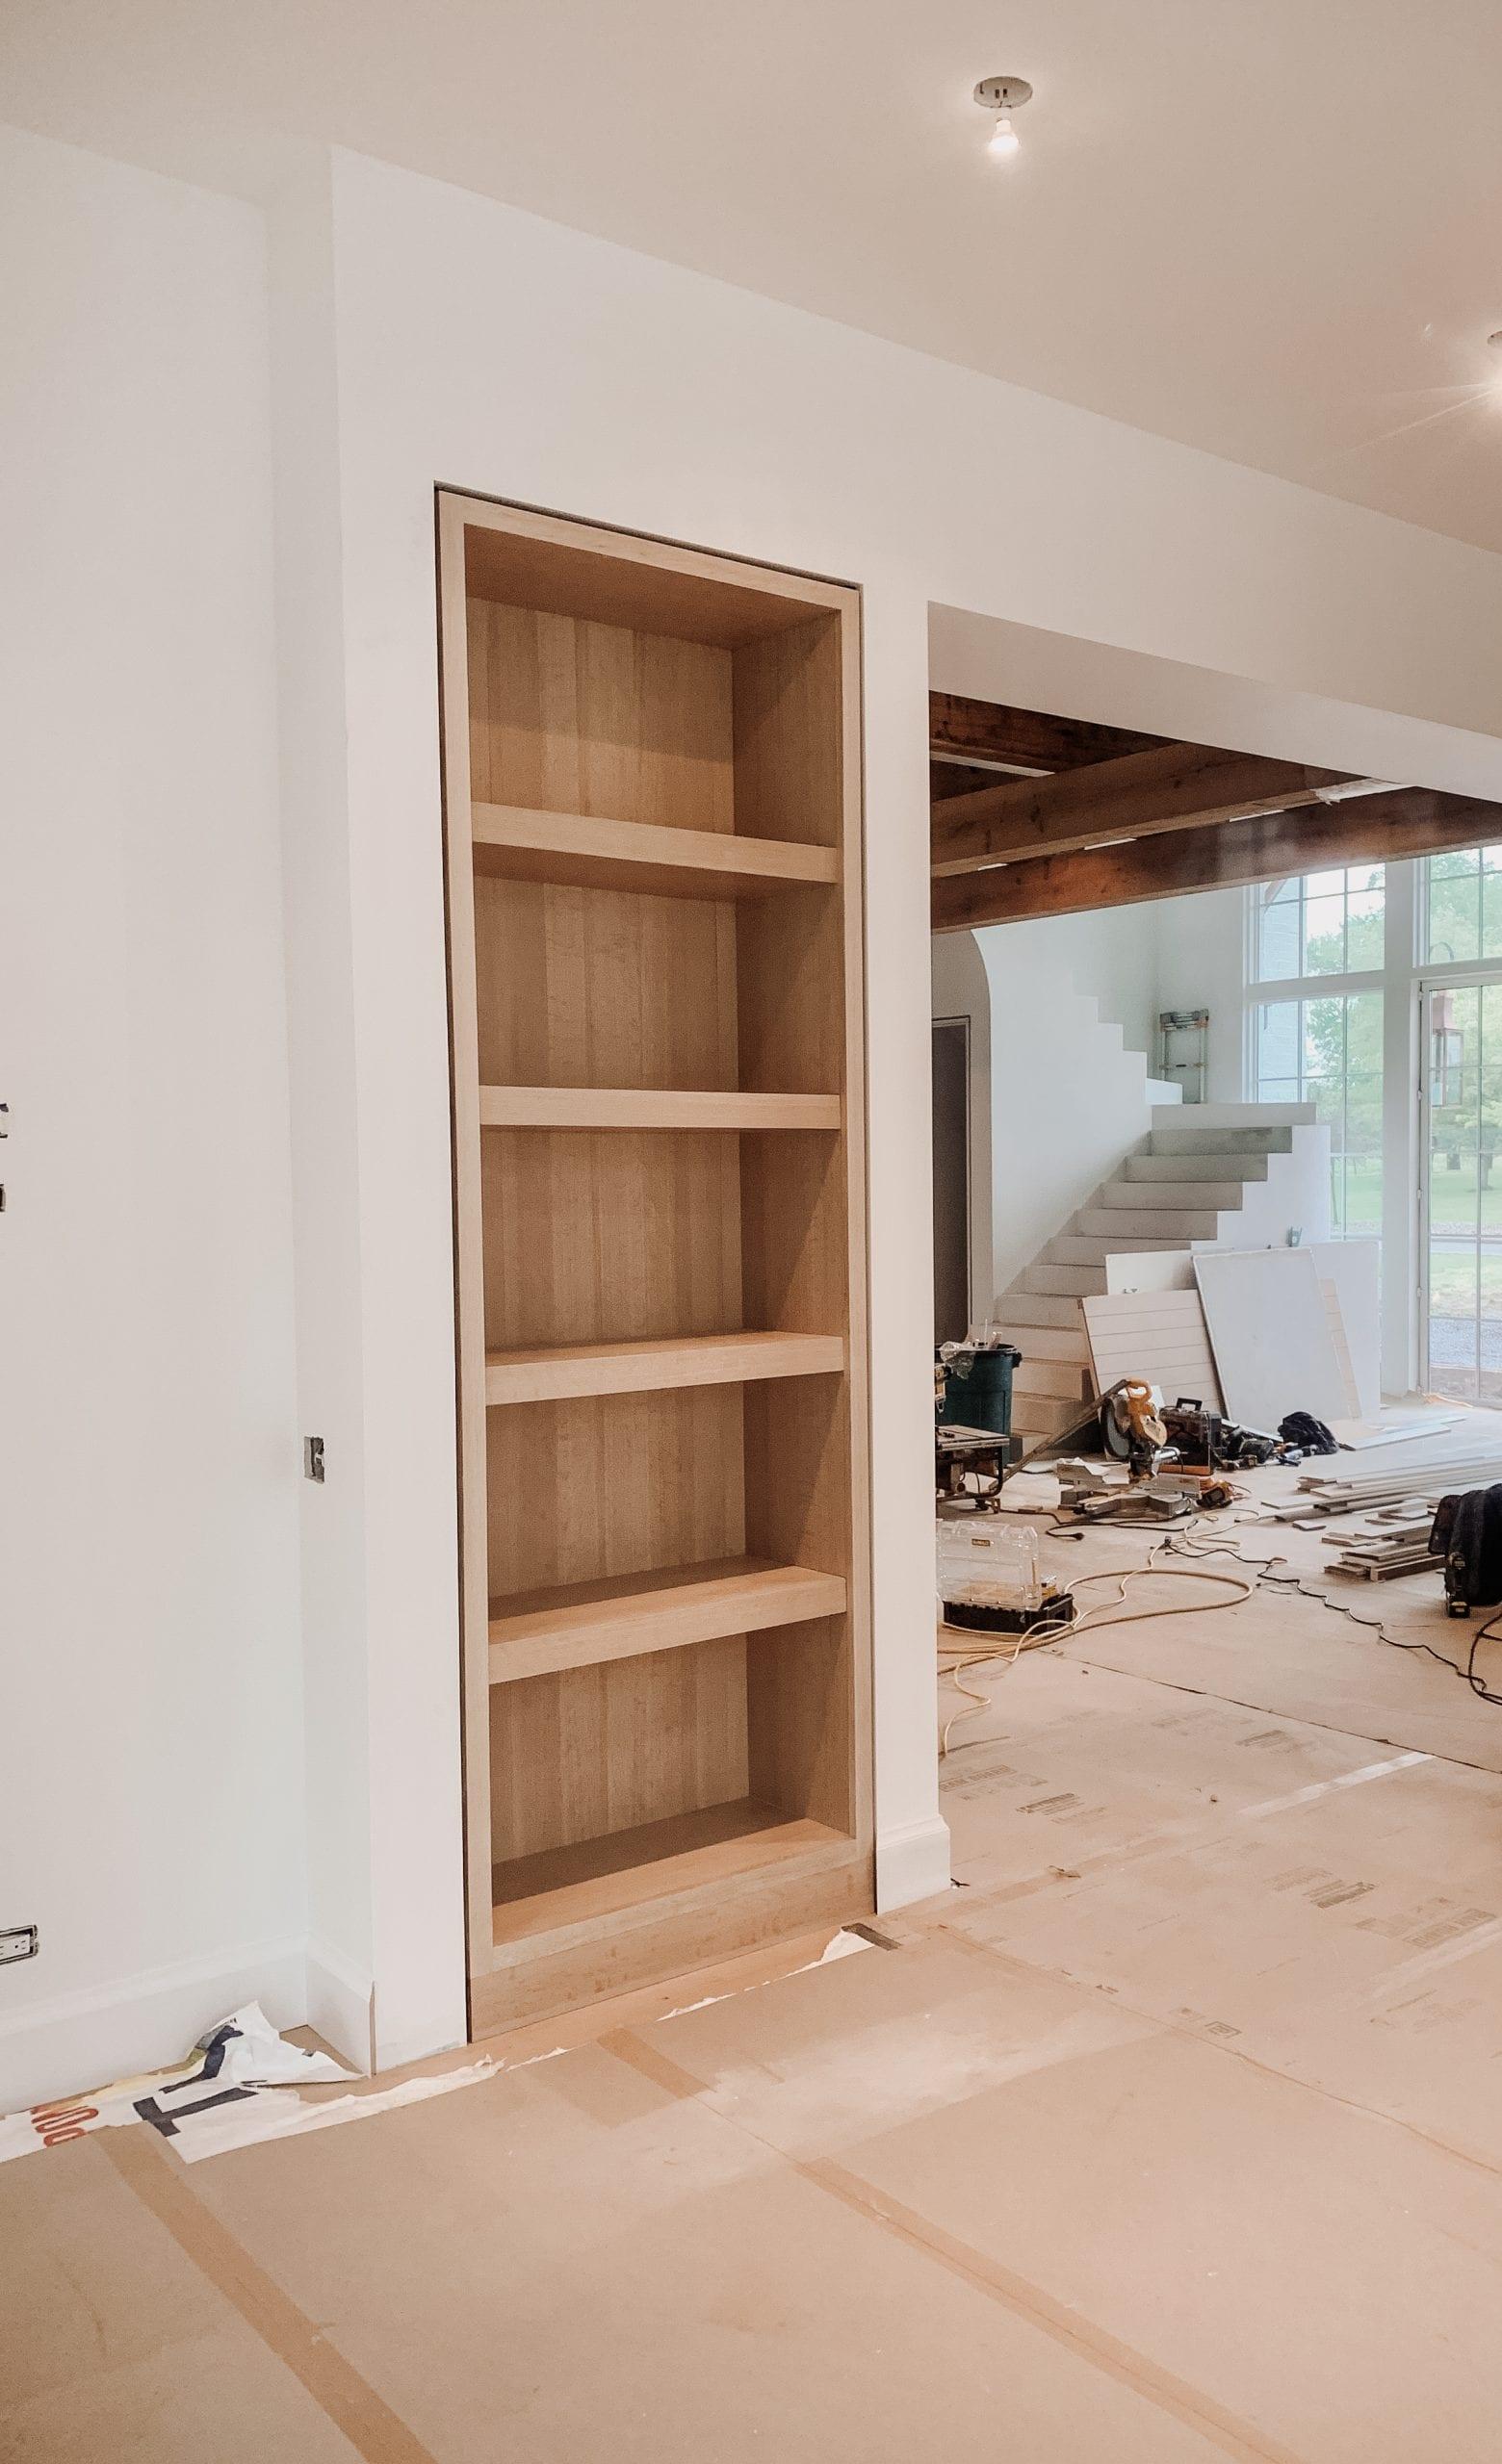 Built in Wooden Shelving